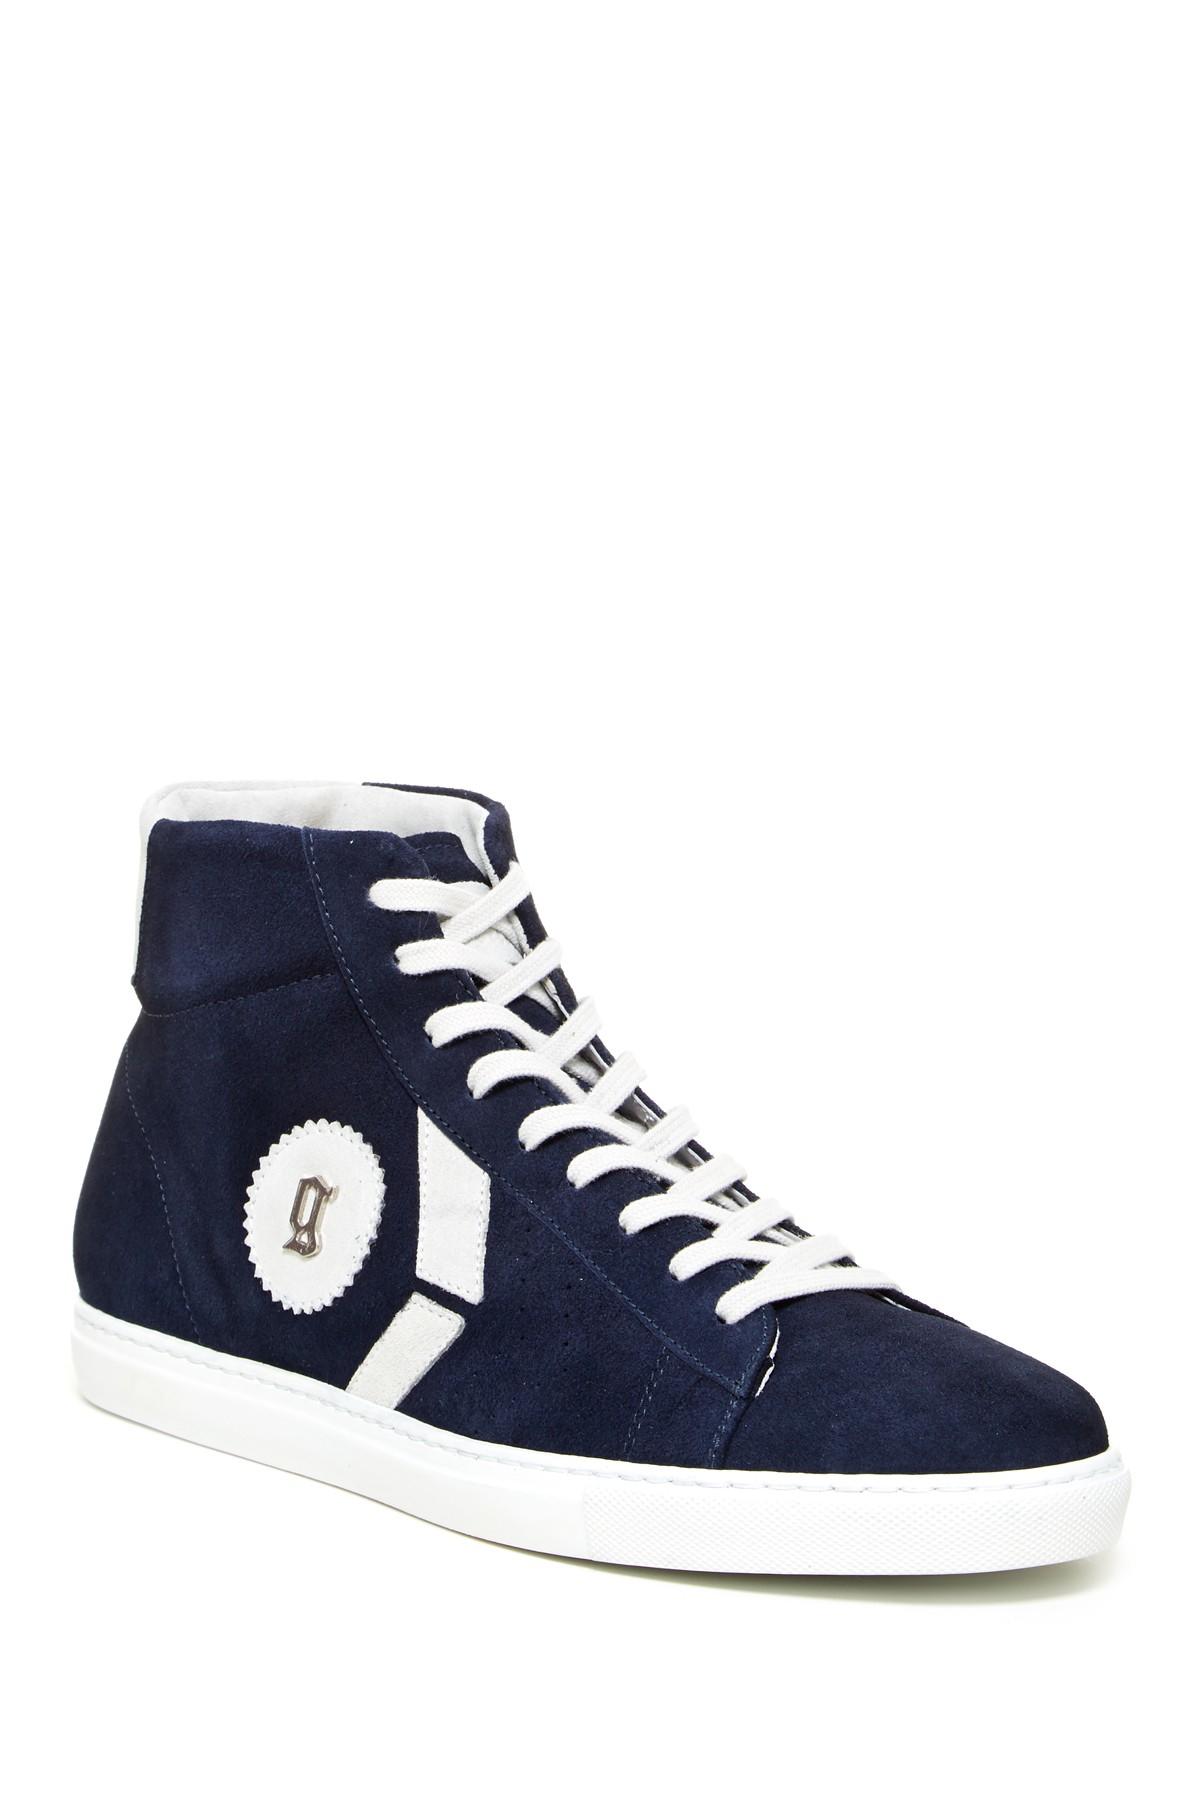 John Galliano Shoes Size Chart